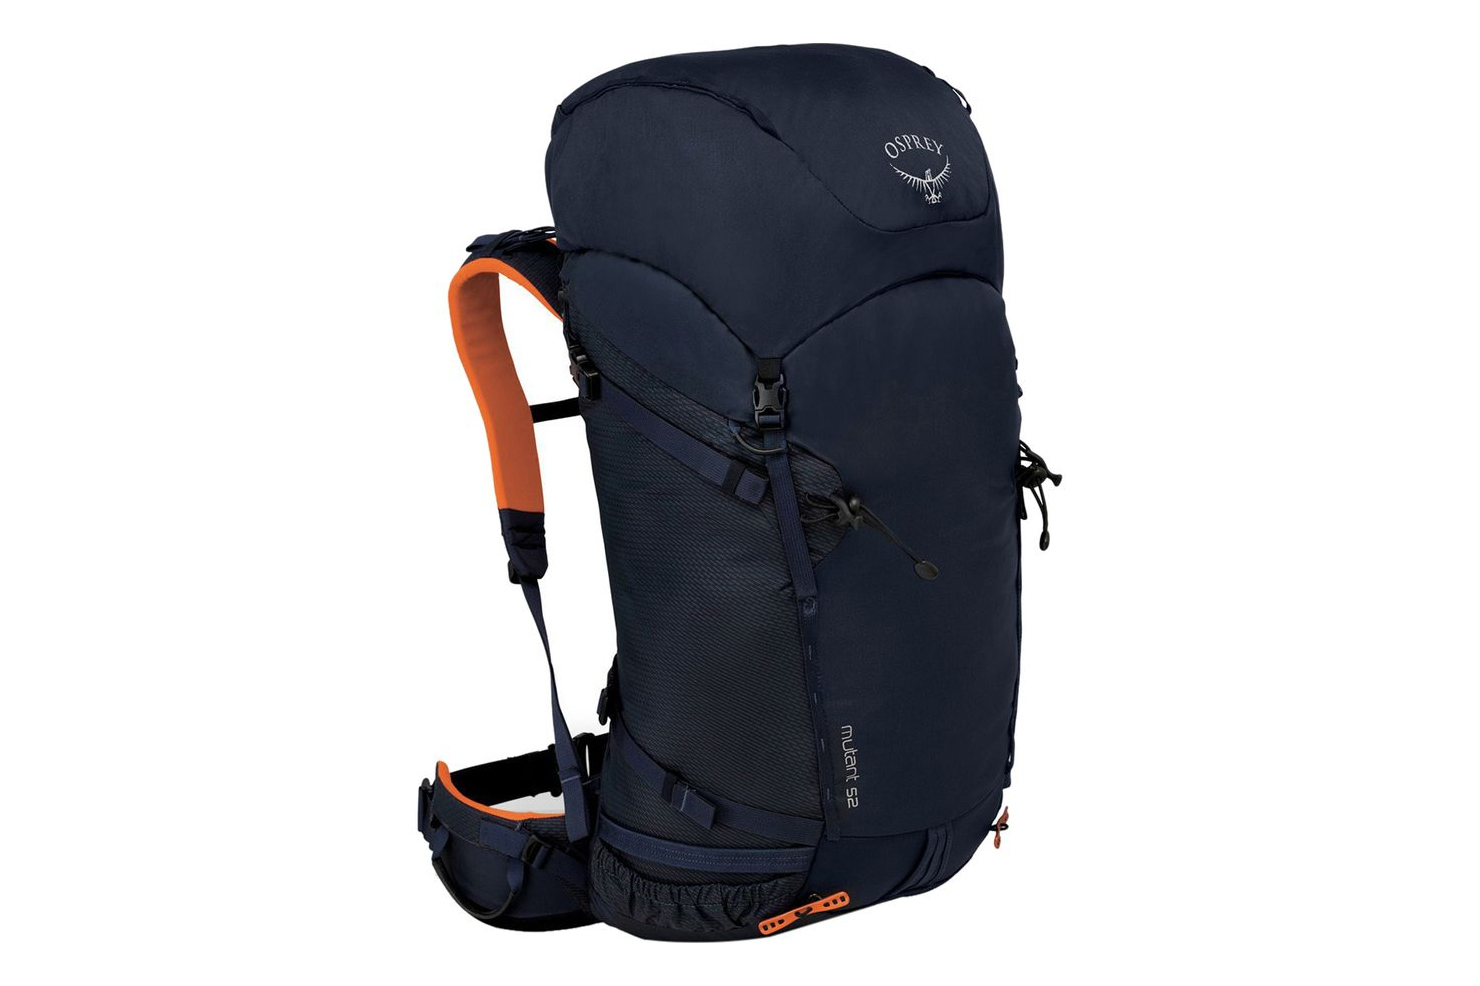 osprey mutant 52 ski backpack